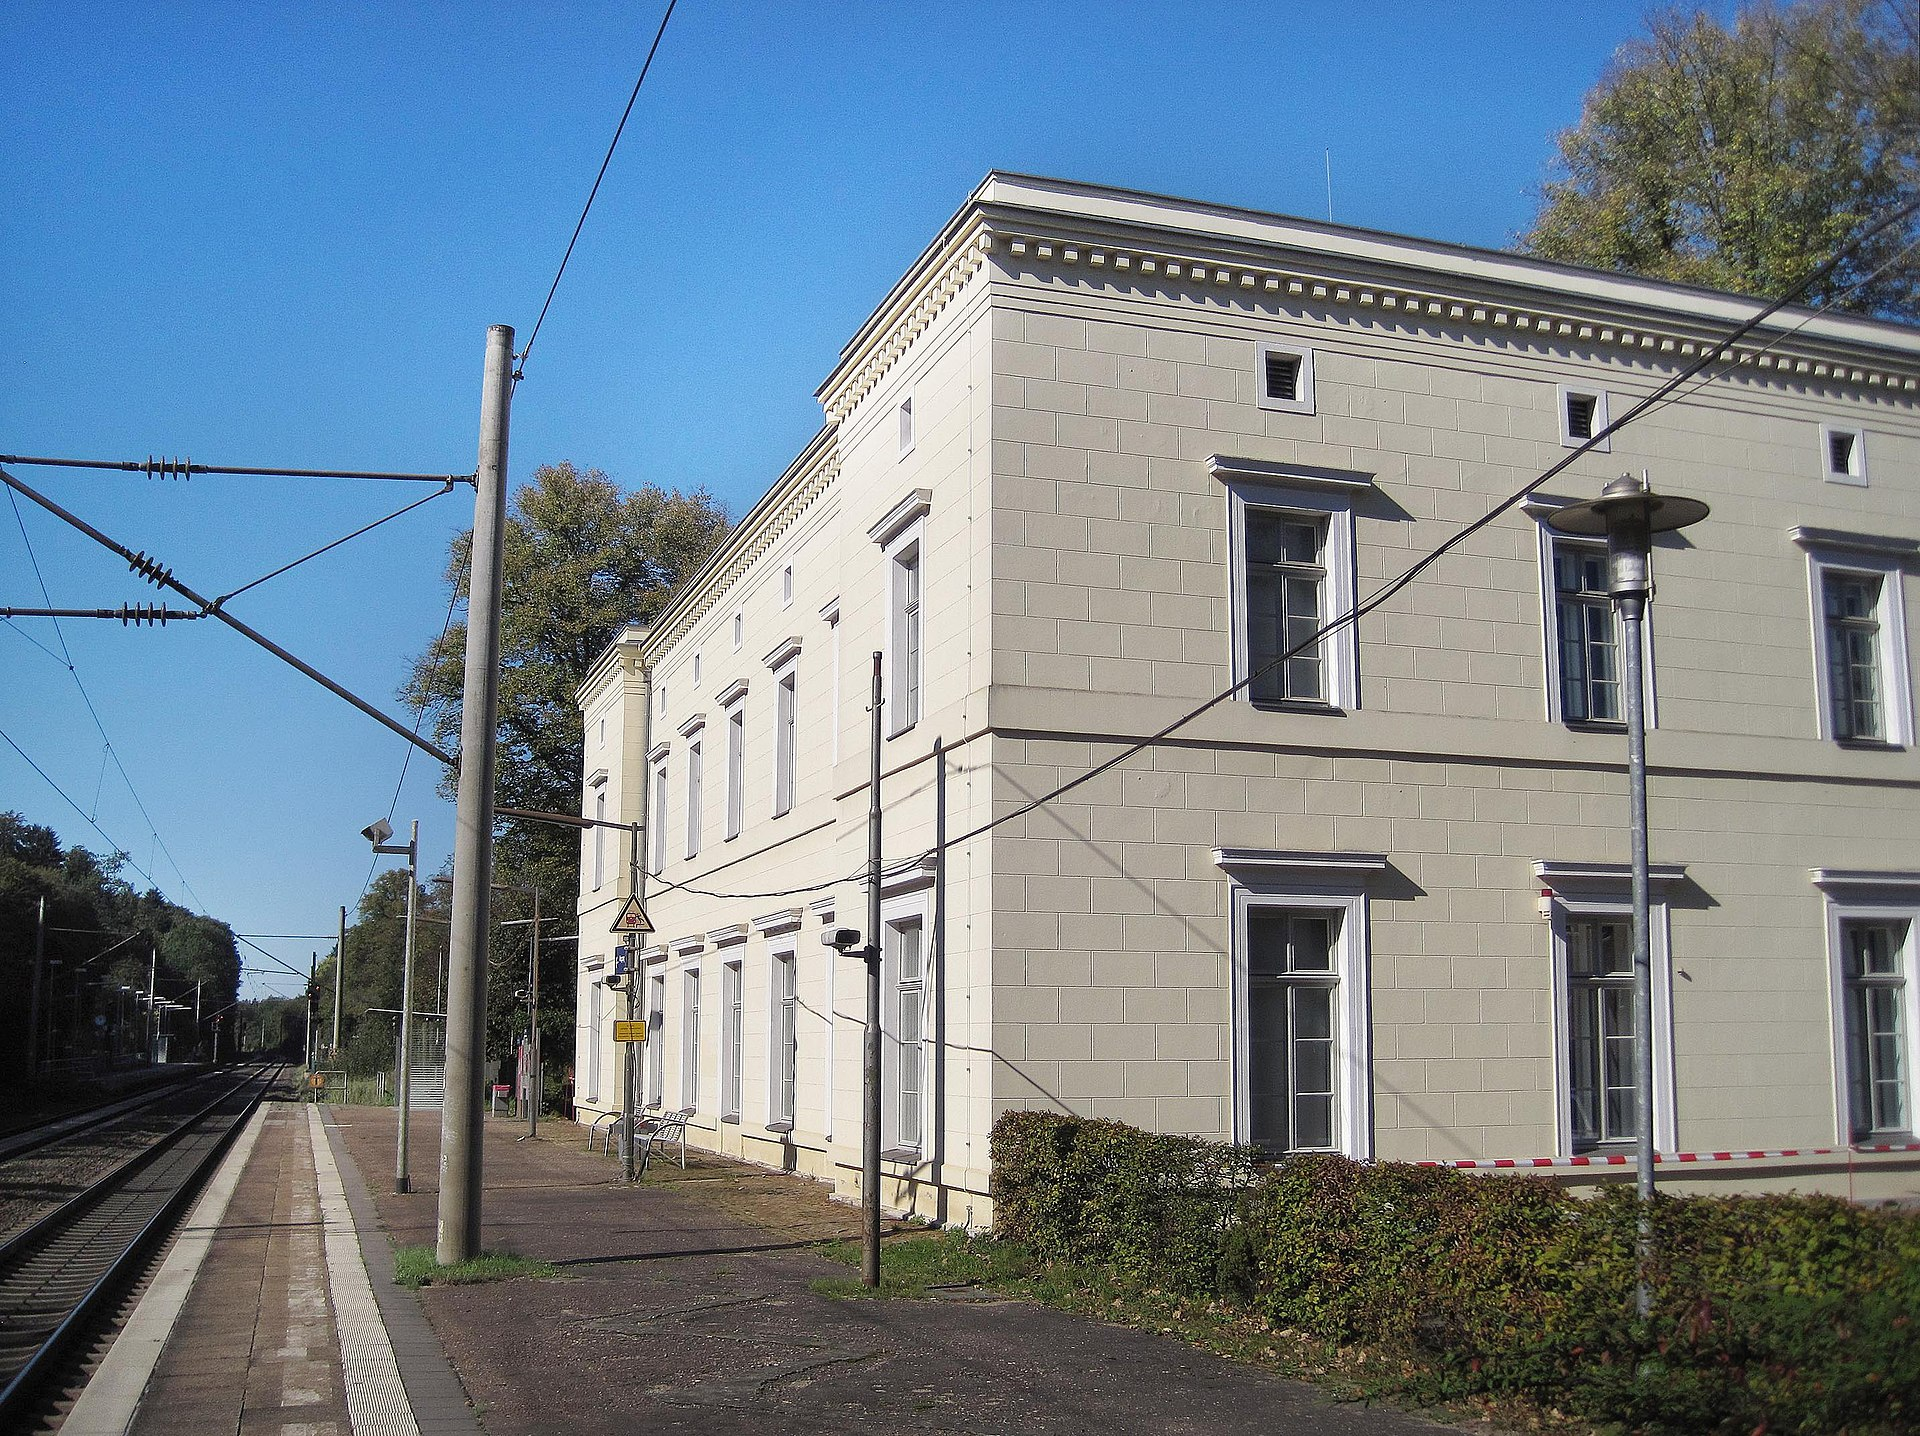 Bahnhof Friedrichsruh Wikipedia